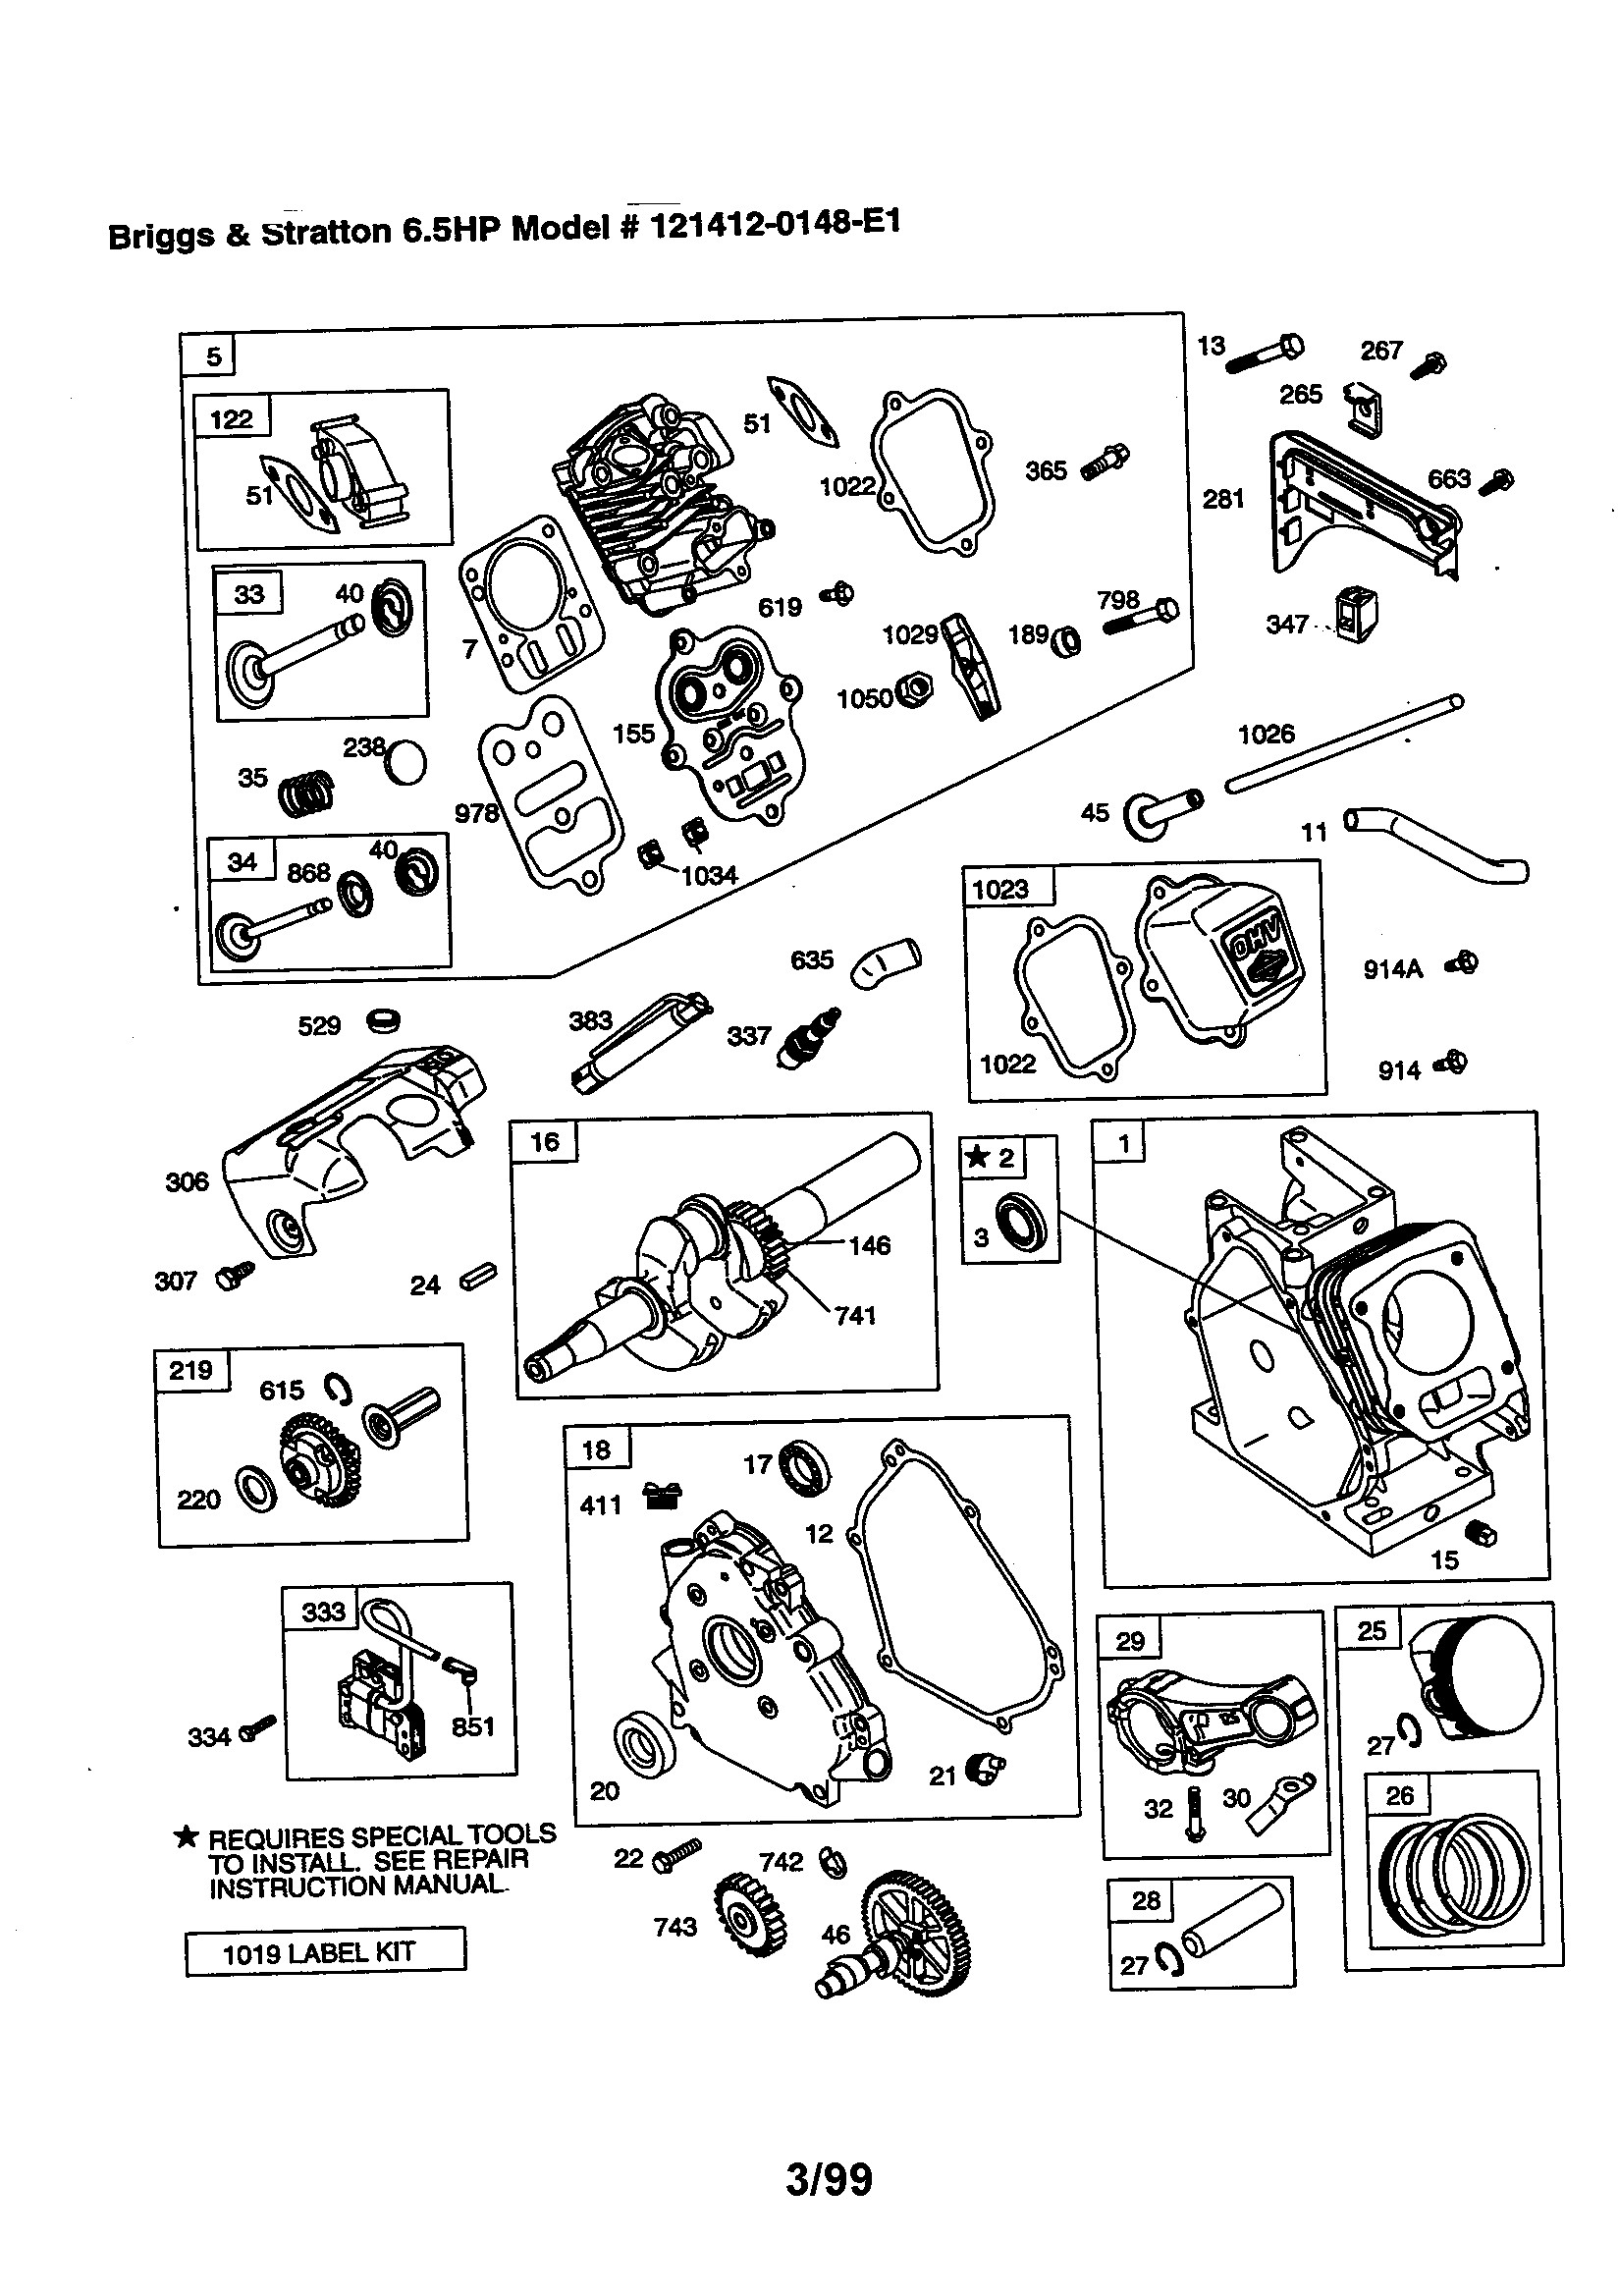 Diagram On Briggs Straton 6.5hp Engine Briggs & Stratton 6 5 Hp Engine Parts Model E1 Of Diagram On Briggs Straton 6.5hp Engine